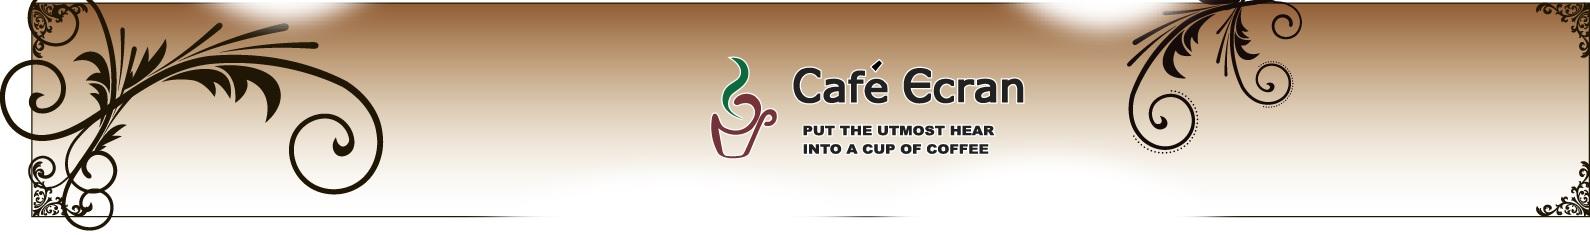 Cafe Ecran